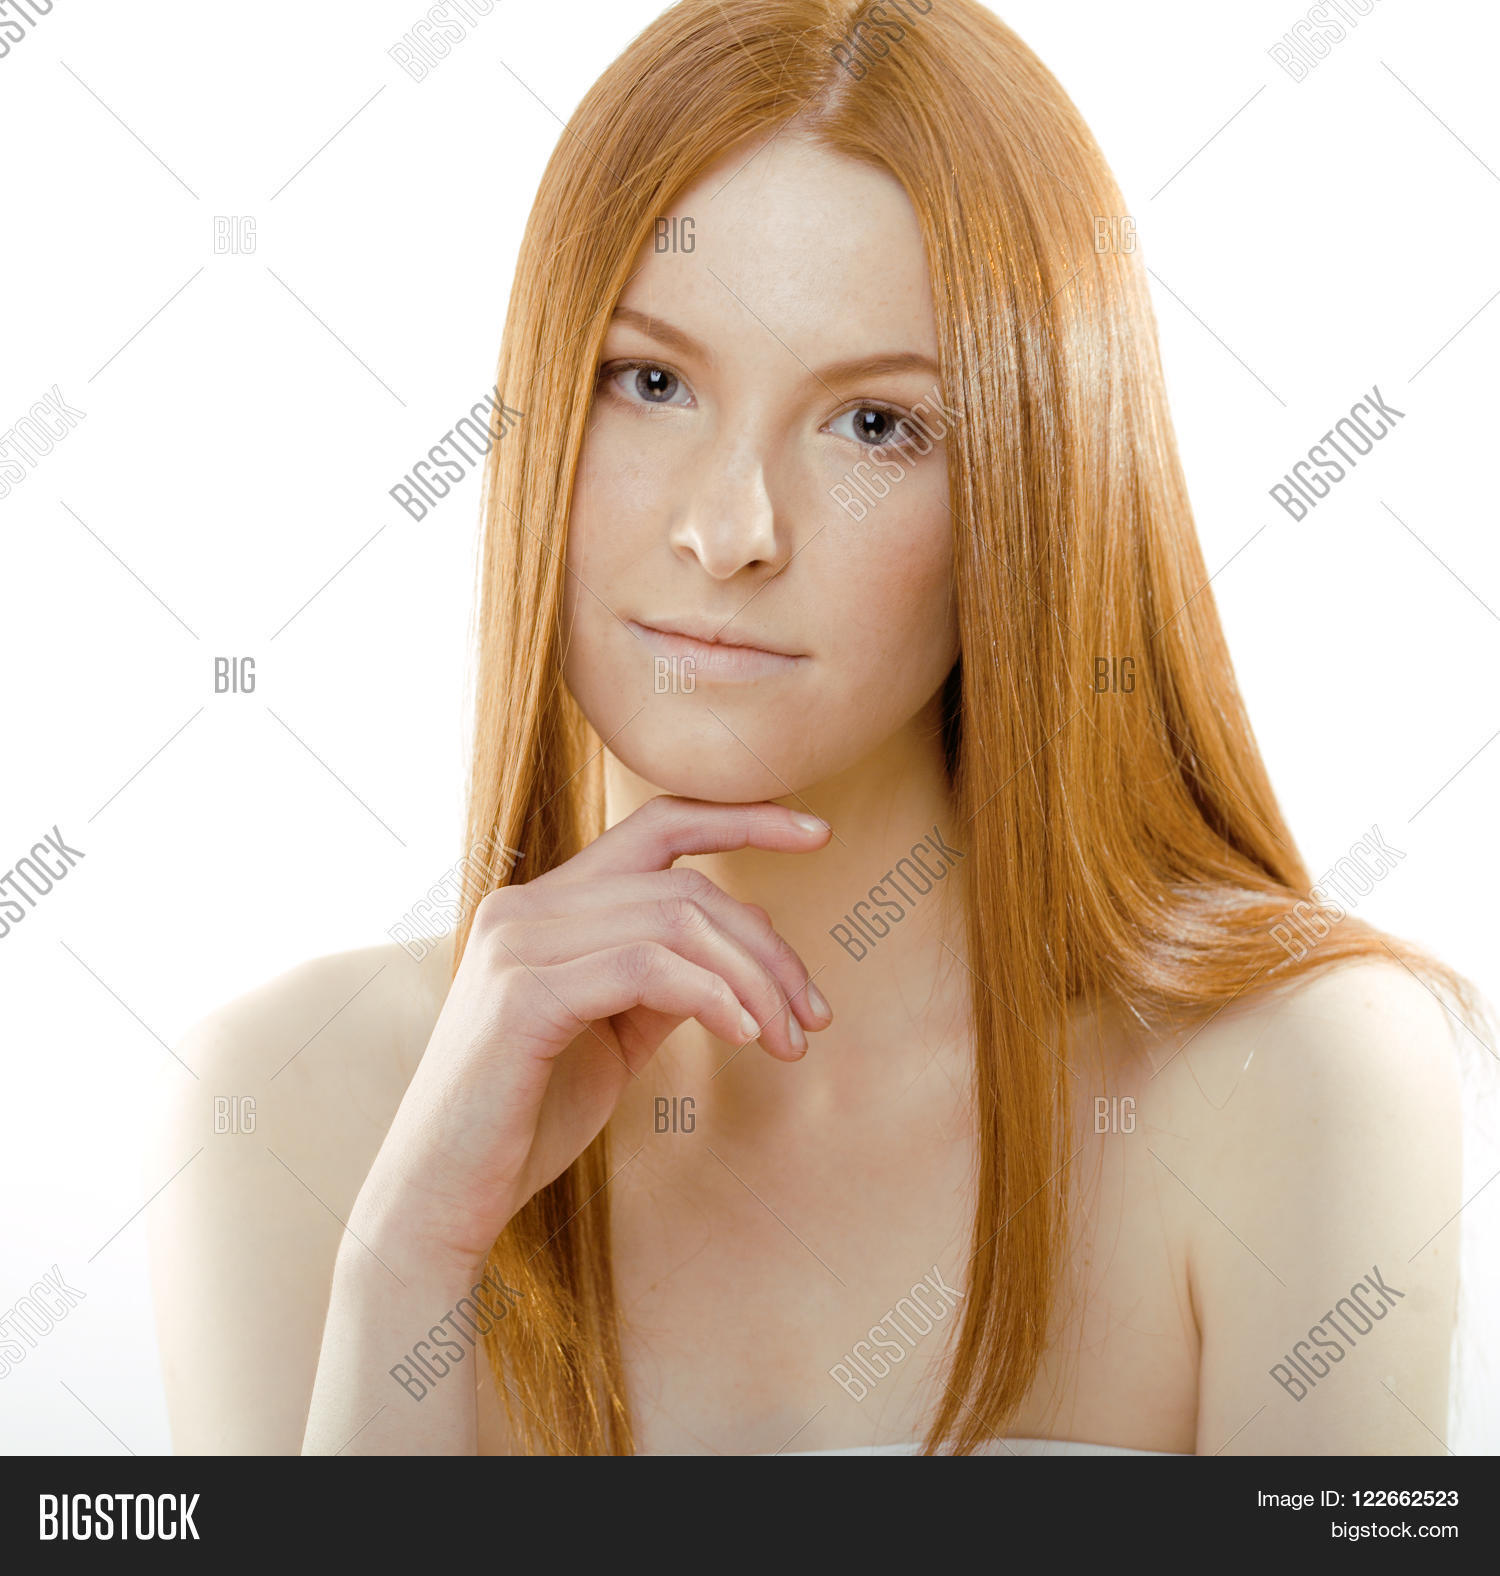 virgin girls nude with dildos